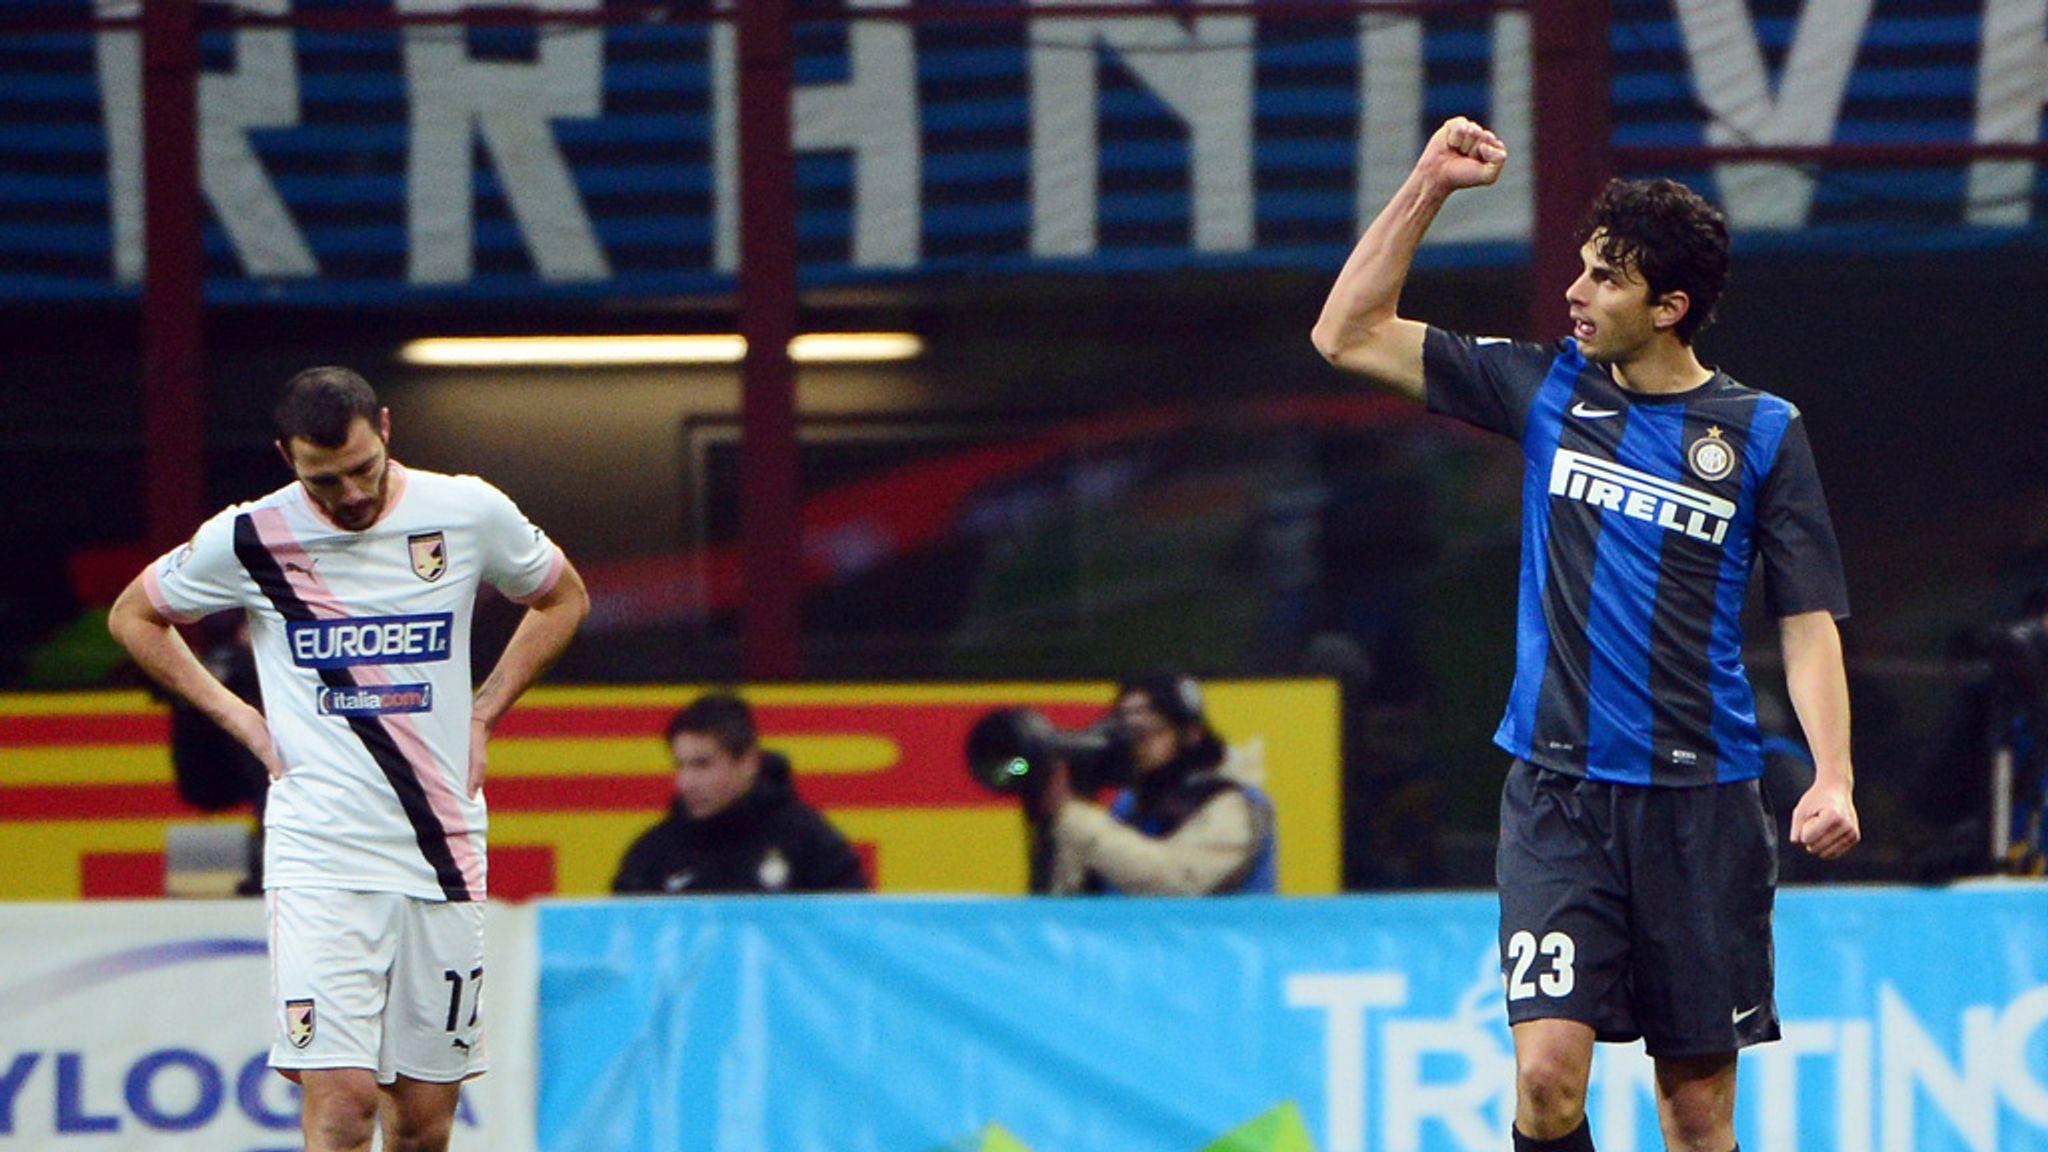 Inter milan vs palermo betting lines explain sport betting odds